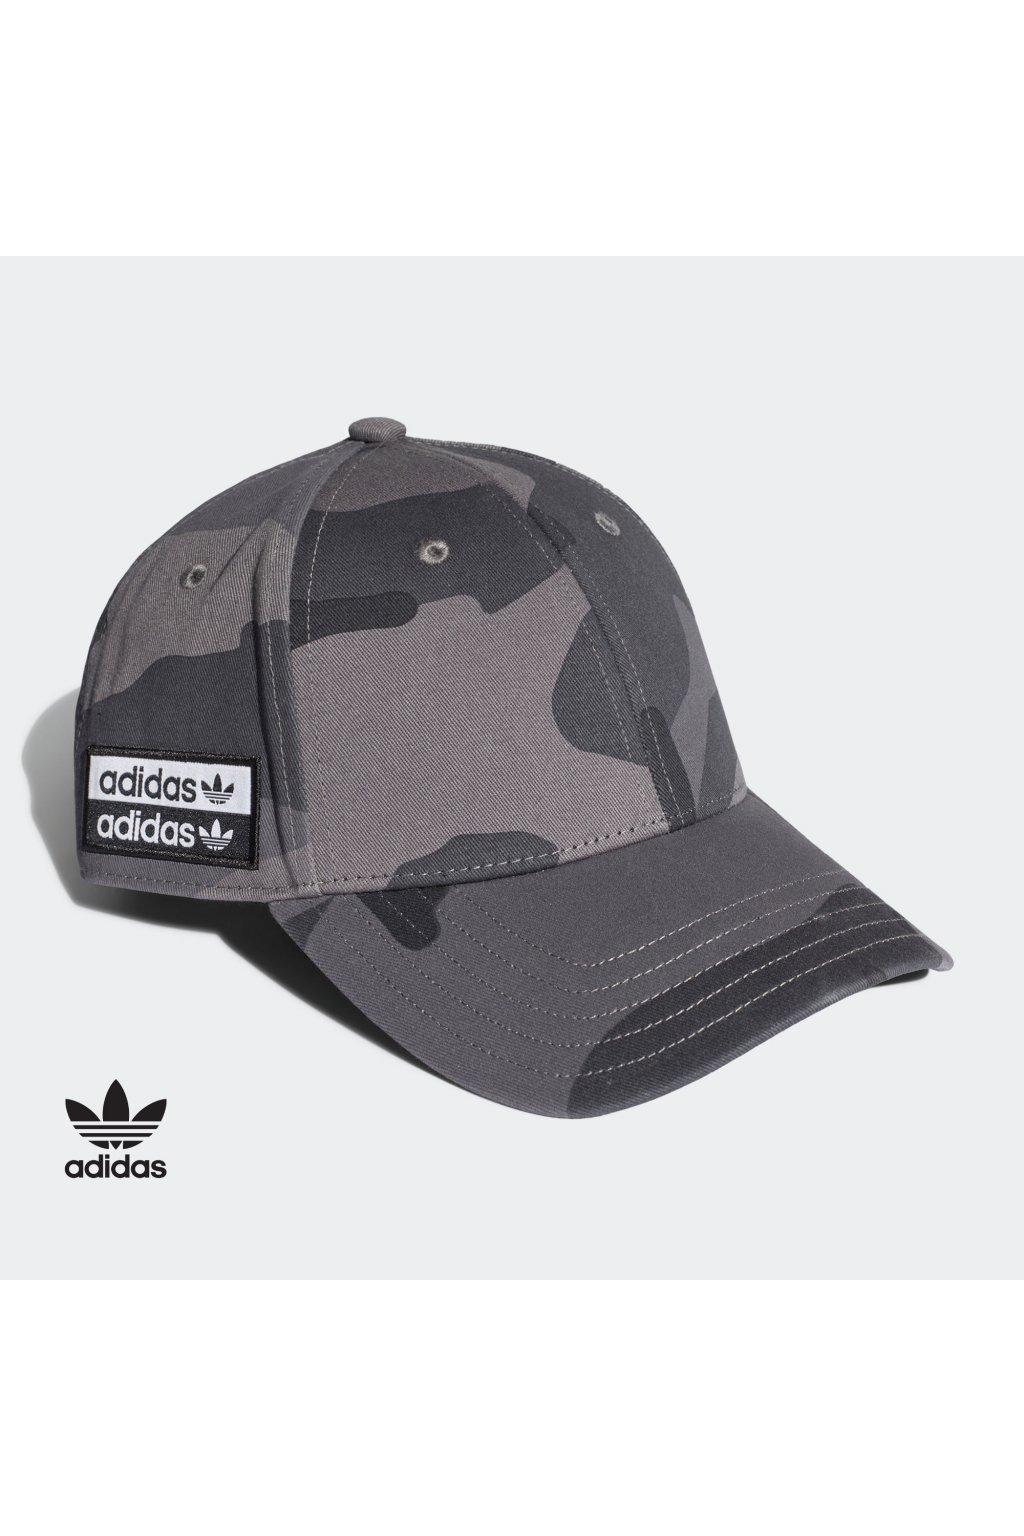 eh4067 adidas camo baseball cap (1)